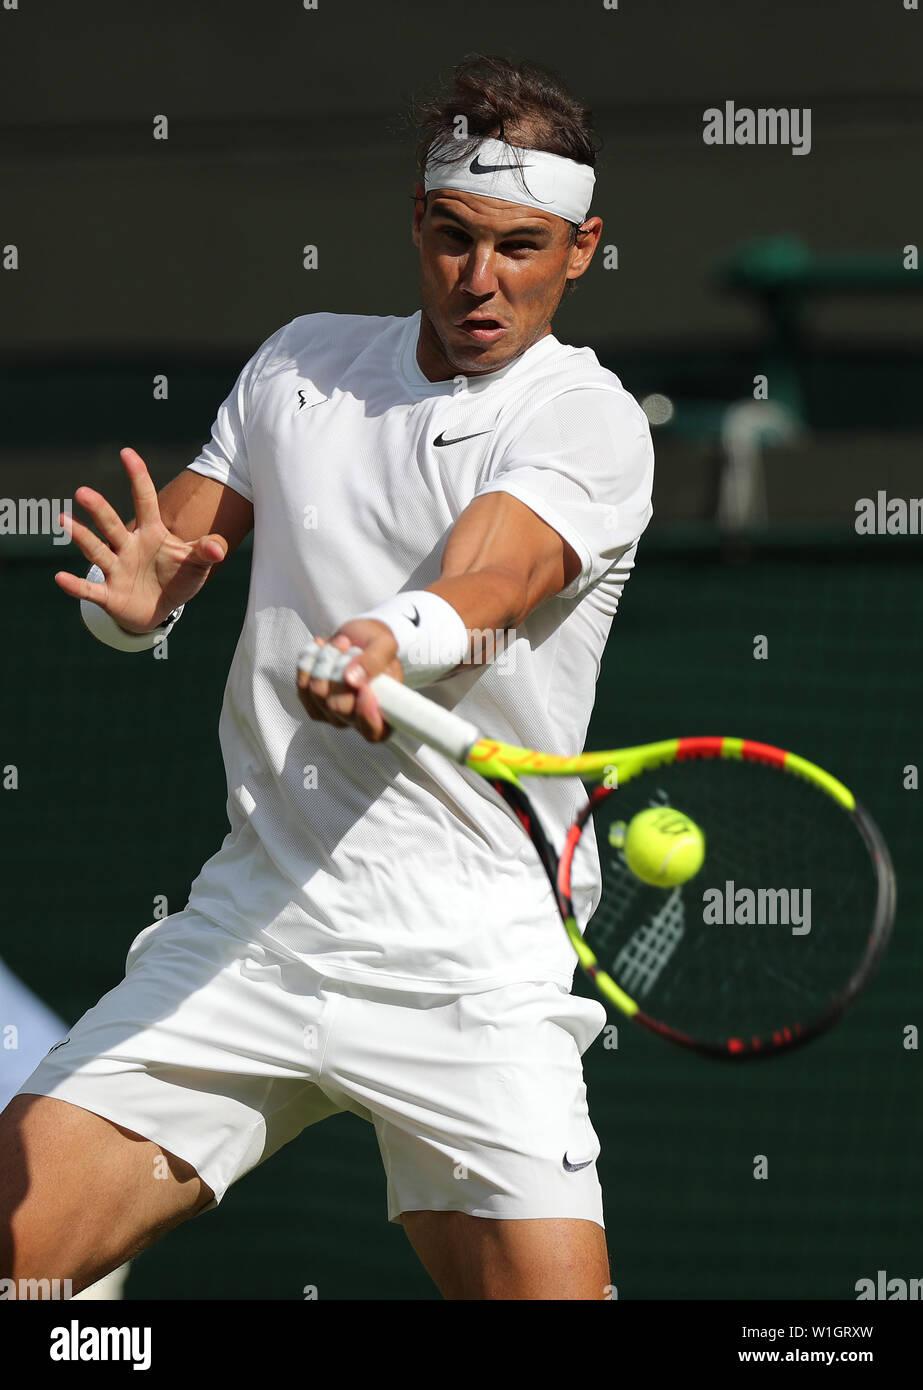 Rafael Nadal 2019 WIMBLEDON Stock Photo